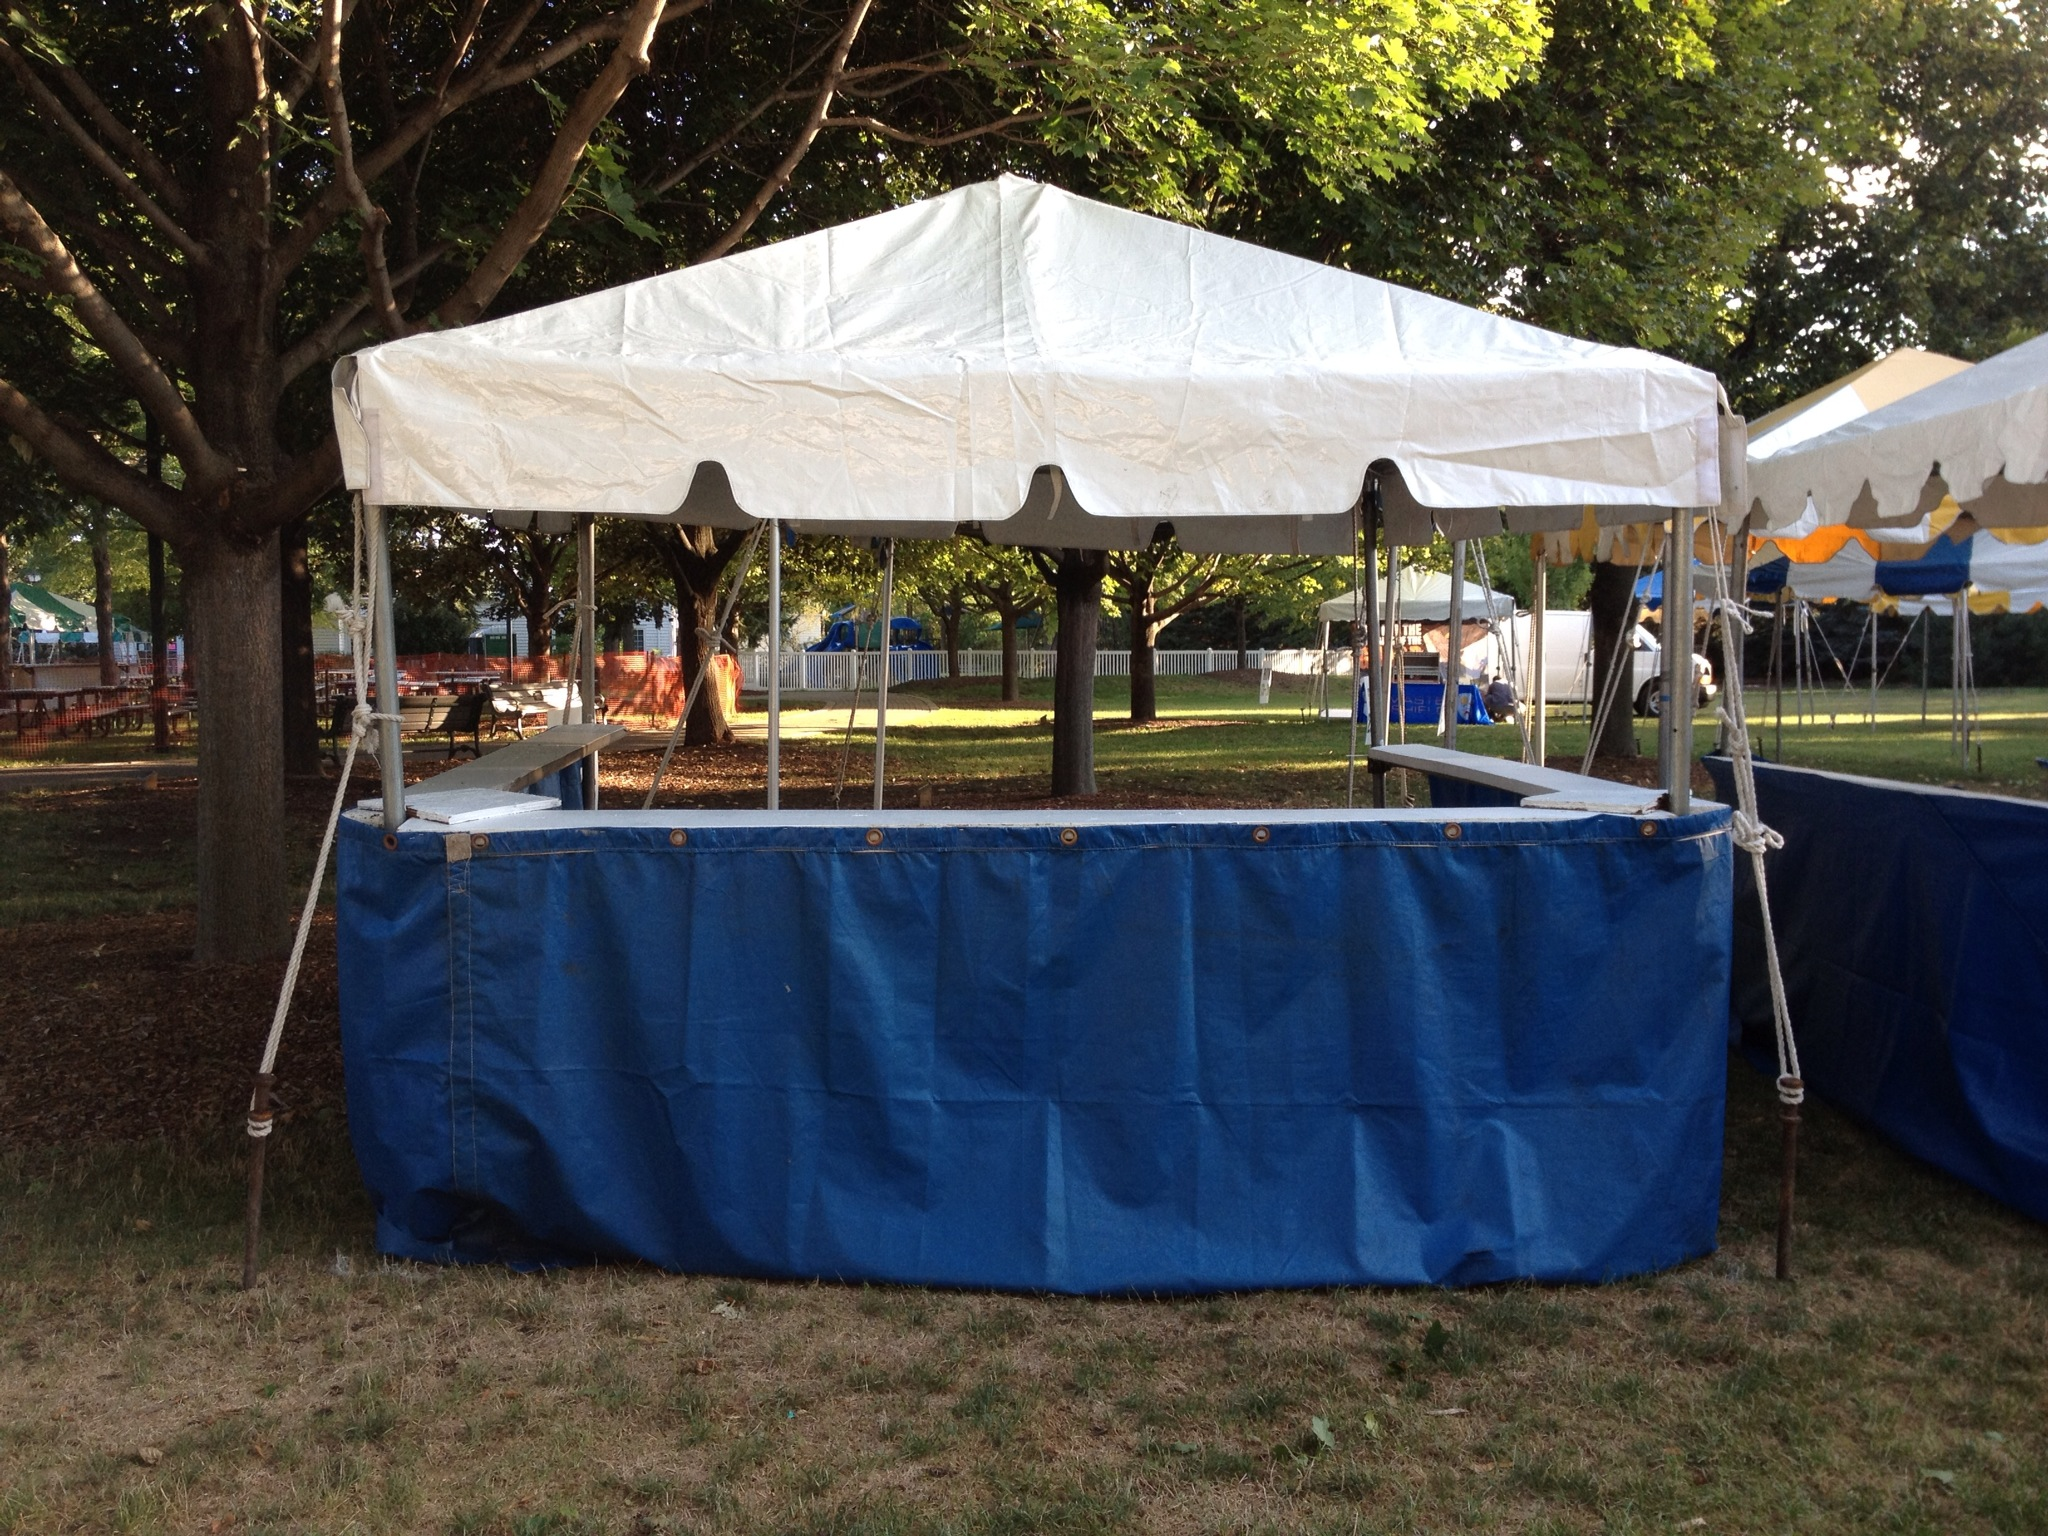 Tent w/ Ledges (Closed to Aisle)